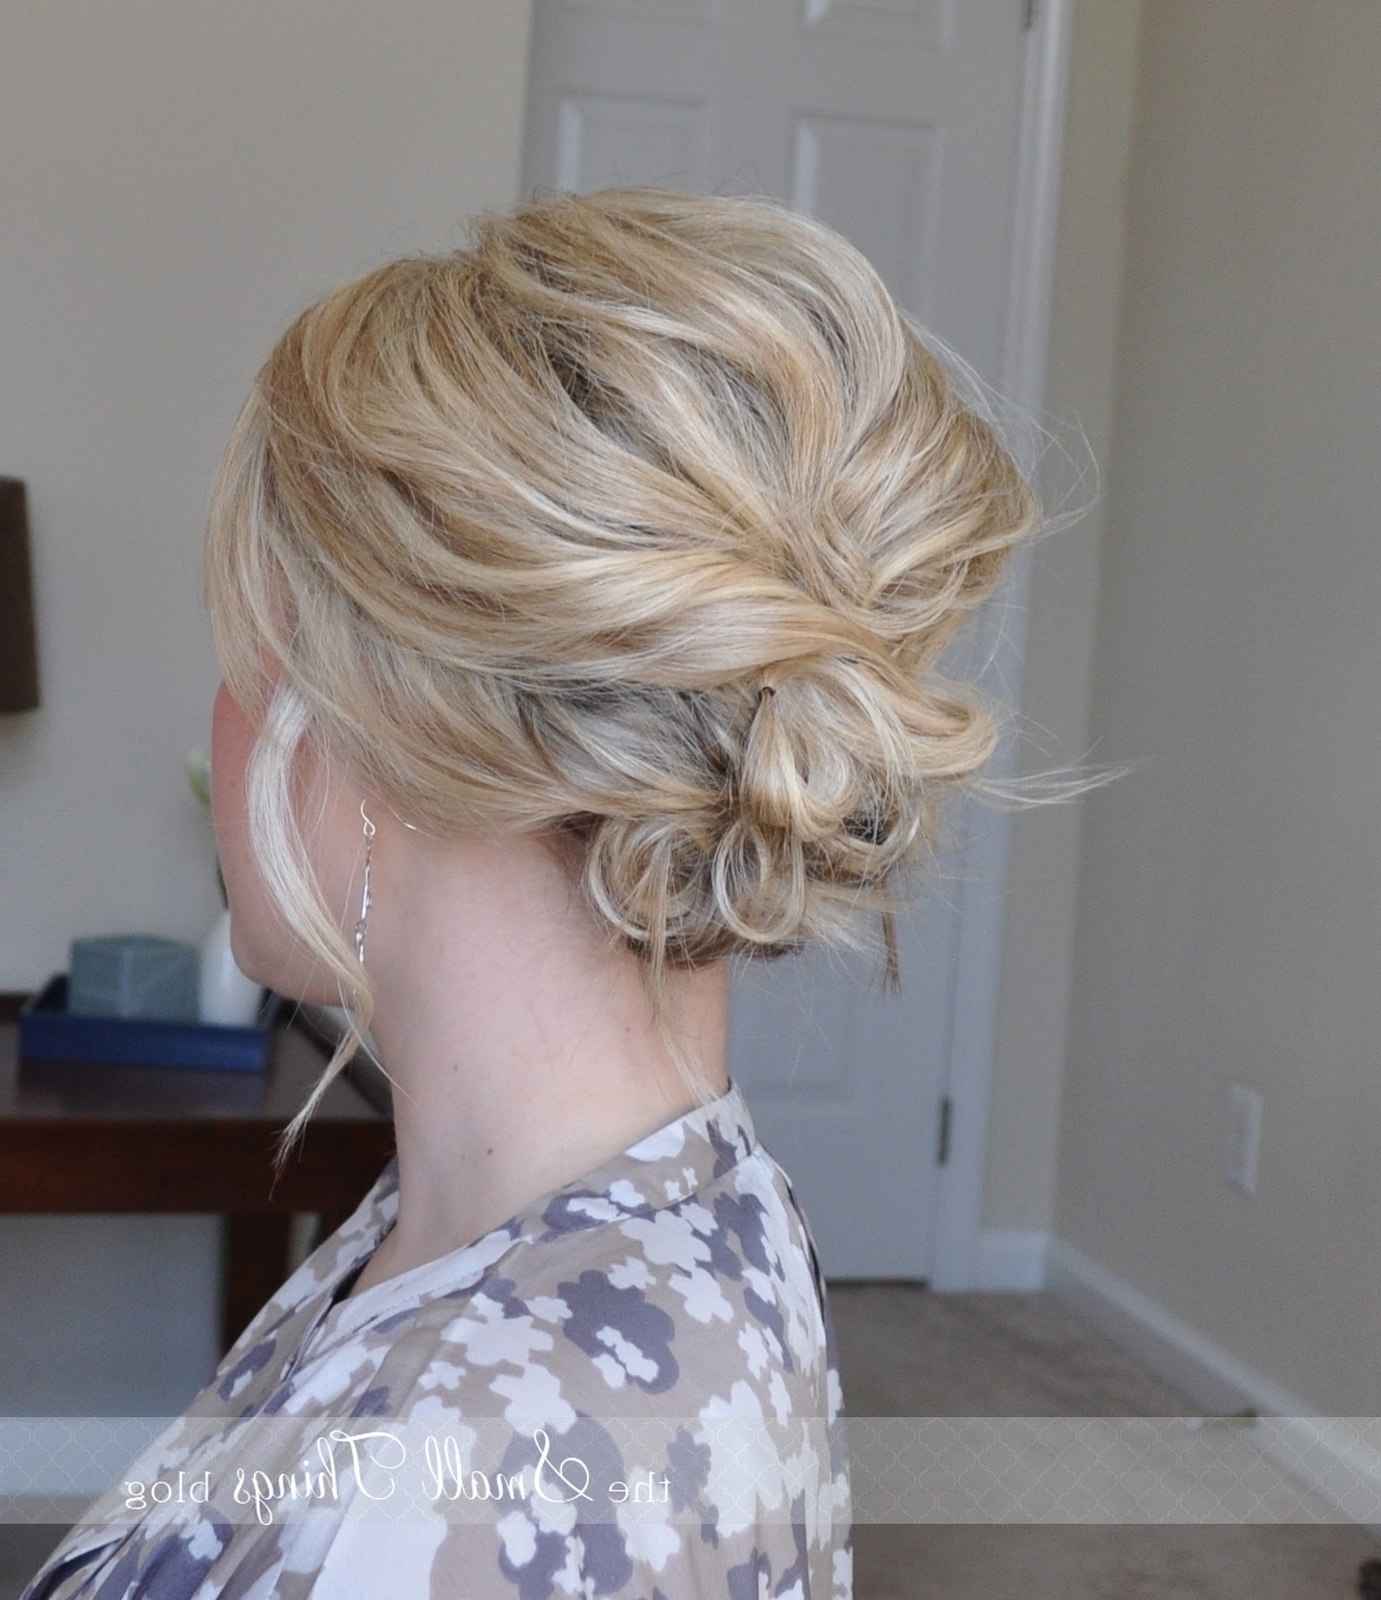 Beach Wedding Hairstyles For Medium Length Hair – Hairstyle For Intended For Current Wedding Hairstyles For Medium Length Fine Hair (View 4 of 15)